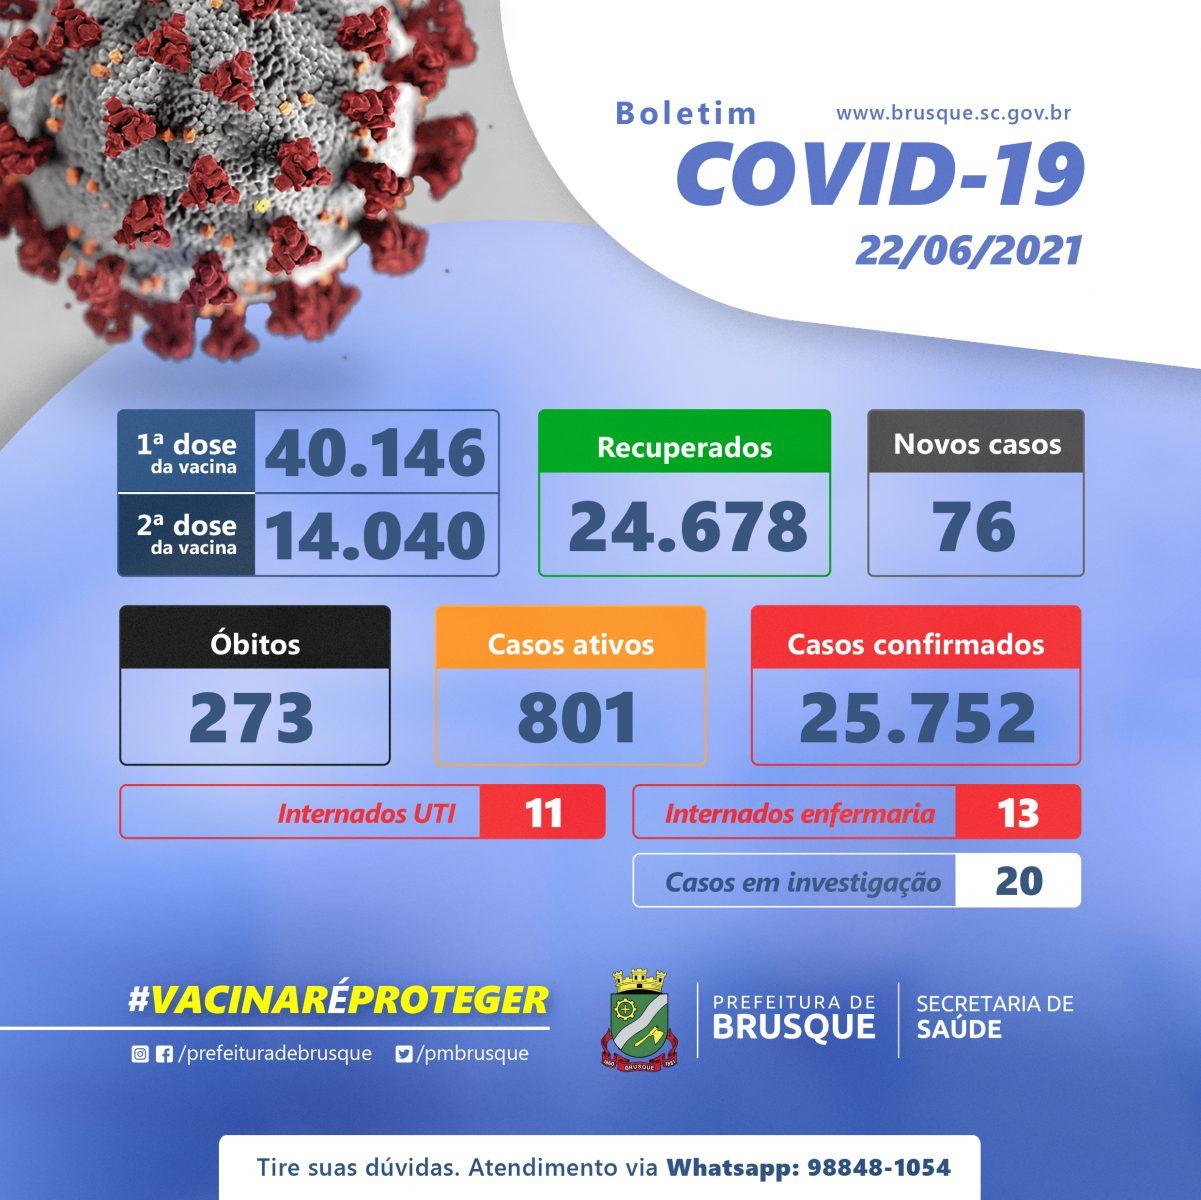 Covid-19: Confira o boletim epidemiológico desta terça-feira (22)